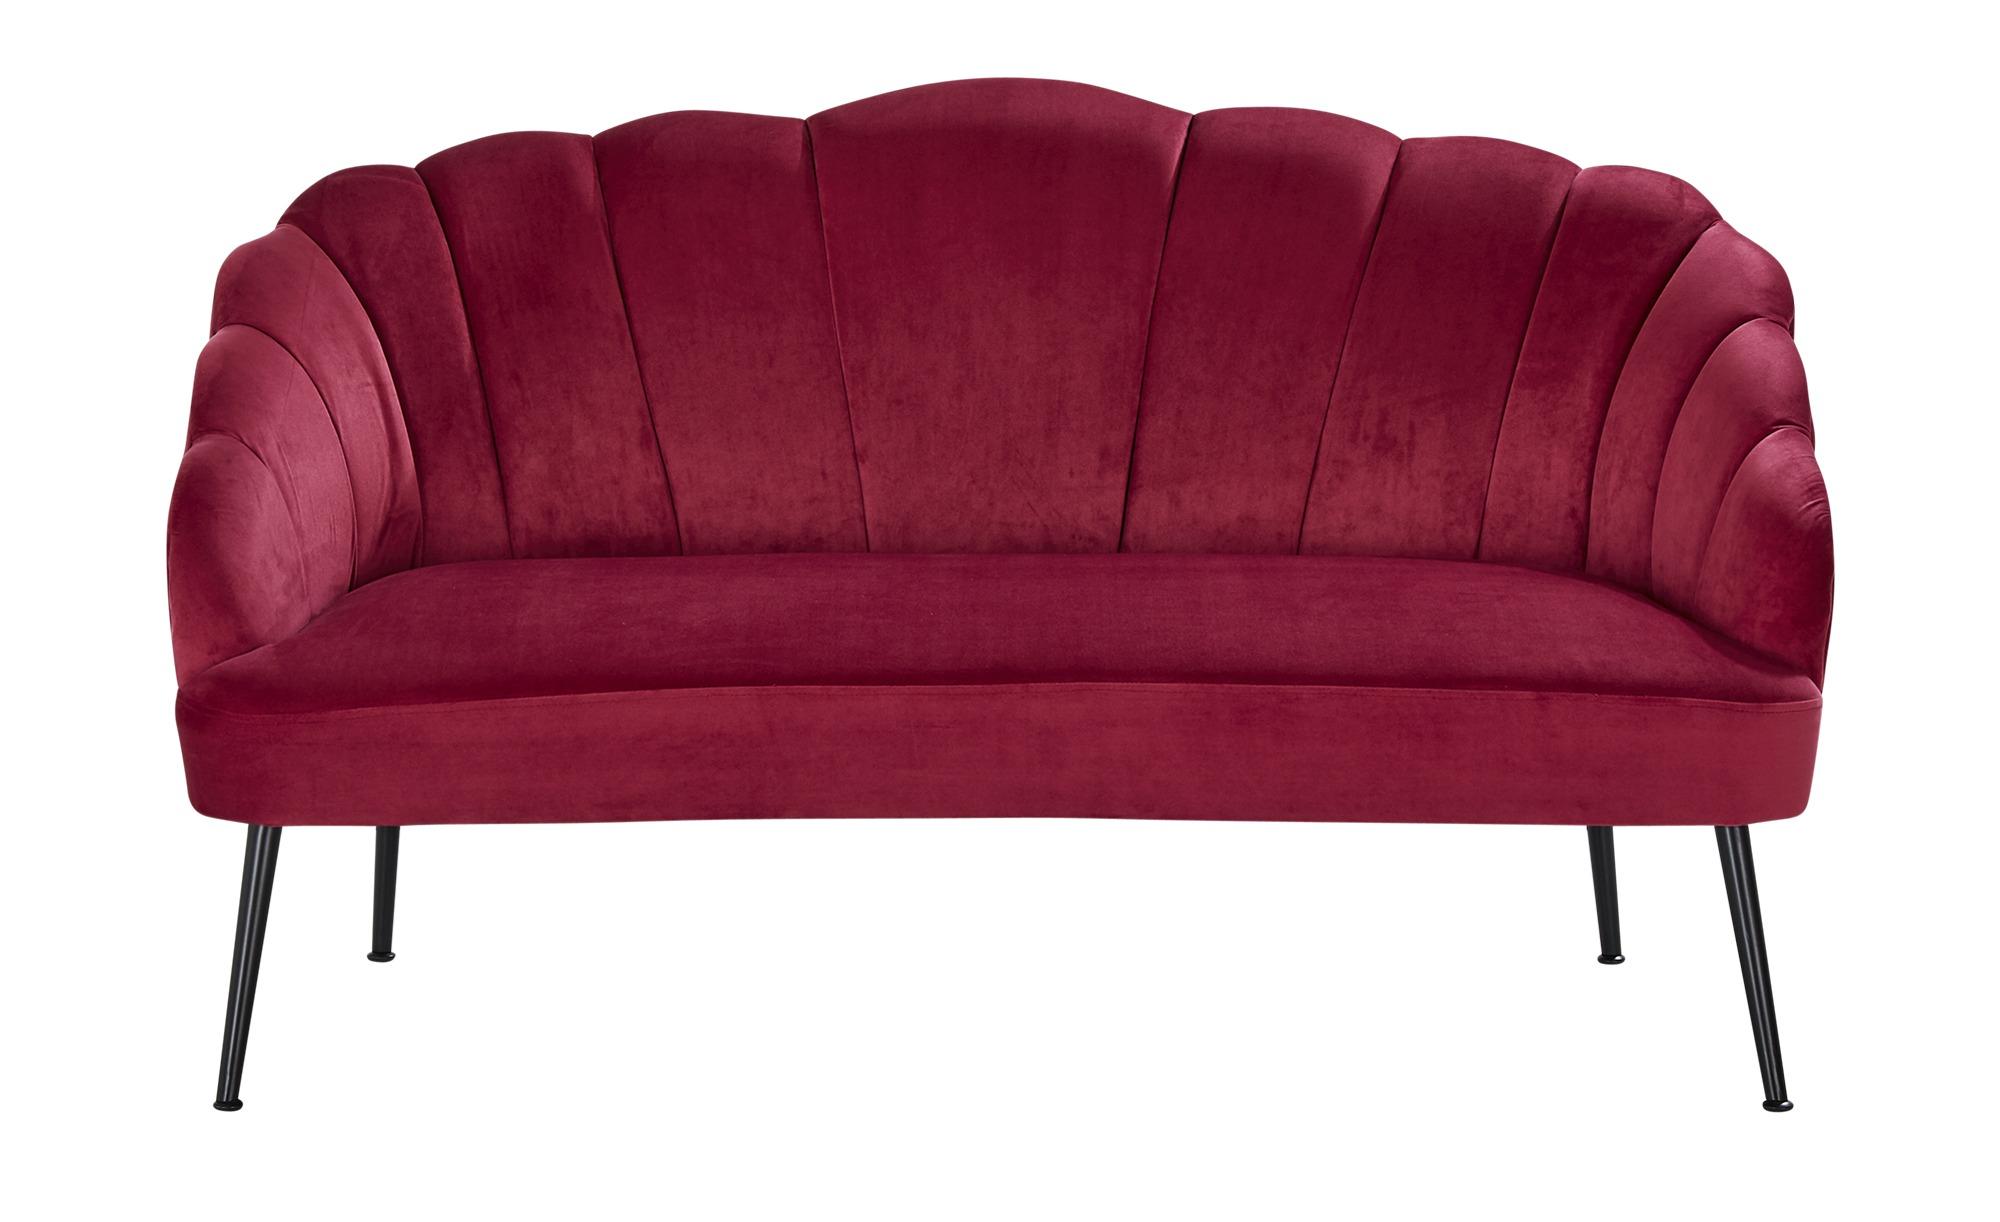 Sofa, 2-Sitzer  Hera ¦ rot ¦ Maße (cm): B: 138 H: 78 T: 71 Polstermöbel > Sofas > 2-Sitzer - Höffner